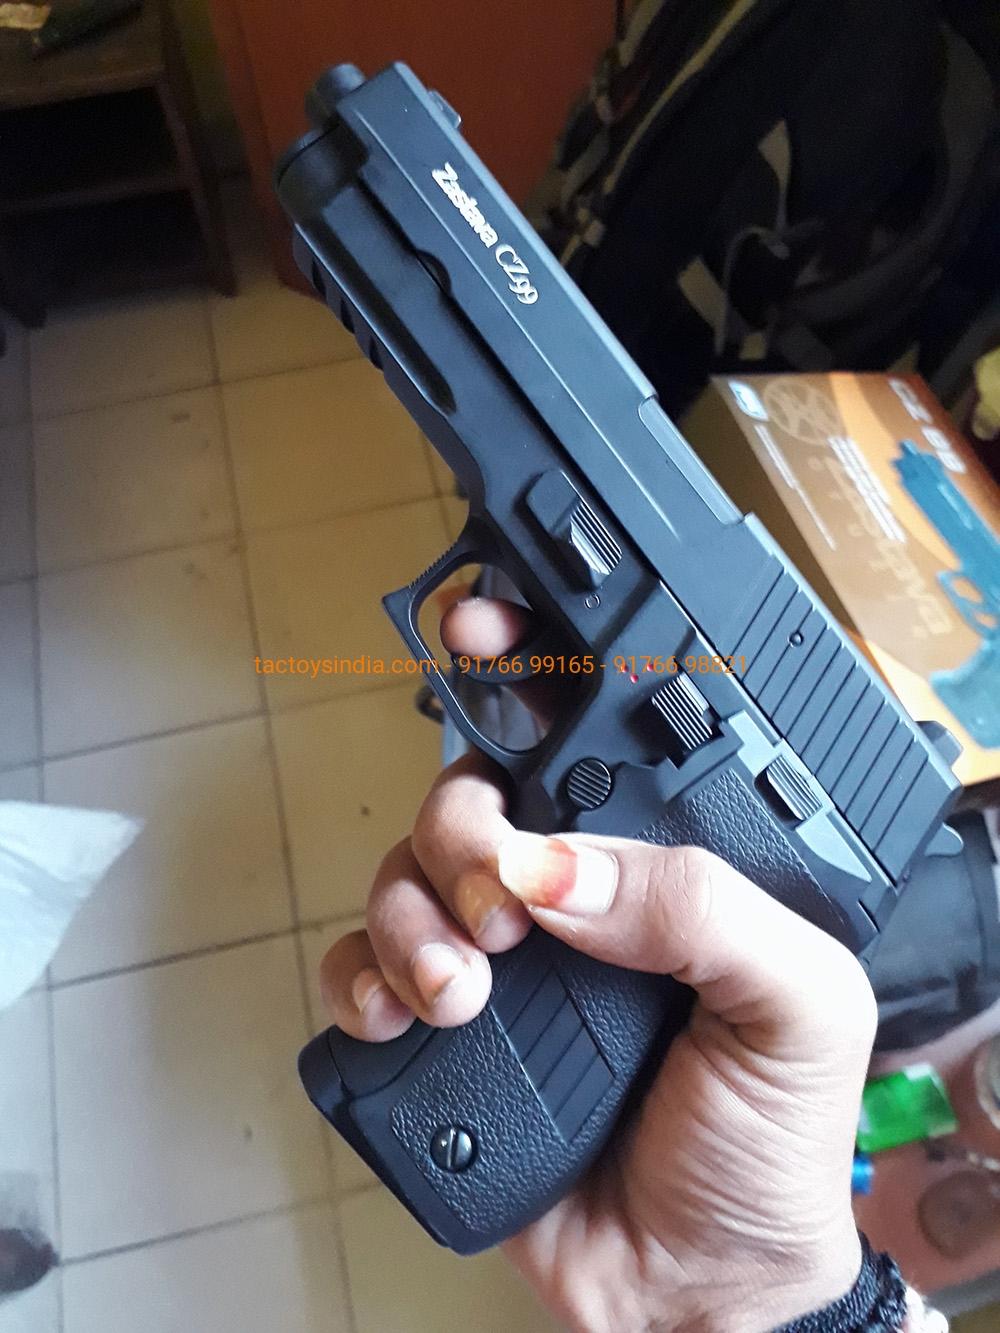 ASG Zastava CZ 99 Automatic Electric Pistol Airsoft Sports Games Replica  Airgun Firing Arms tactoys india